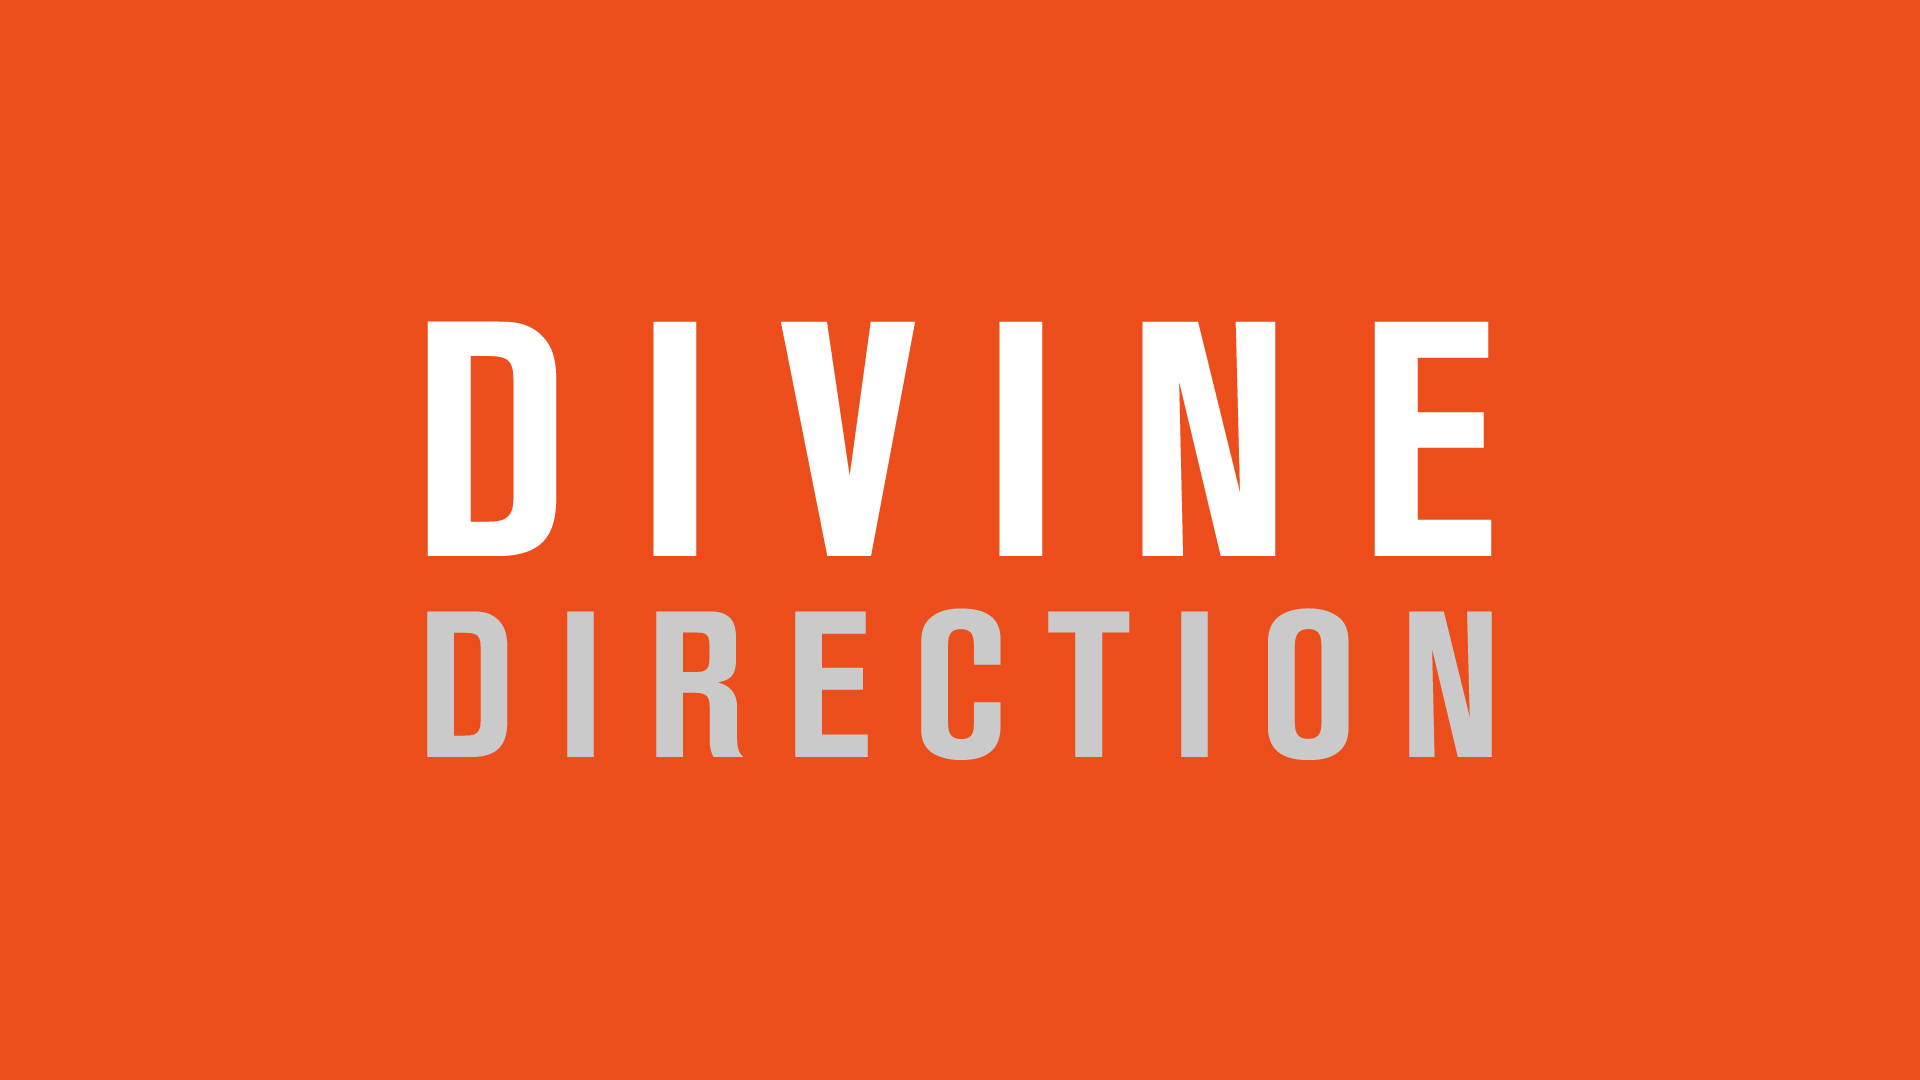 Divine_Direction_Main logo.jpg